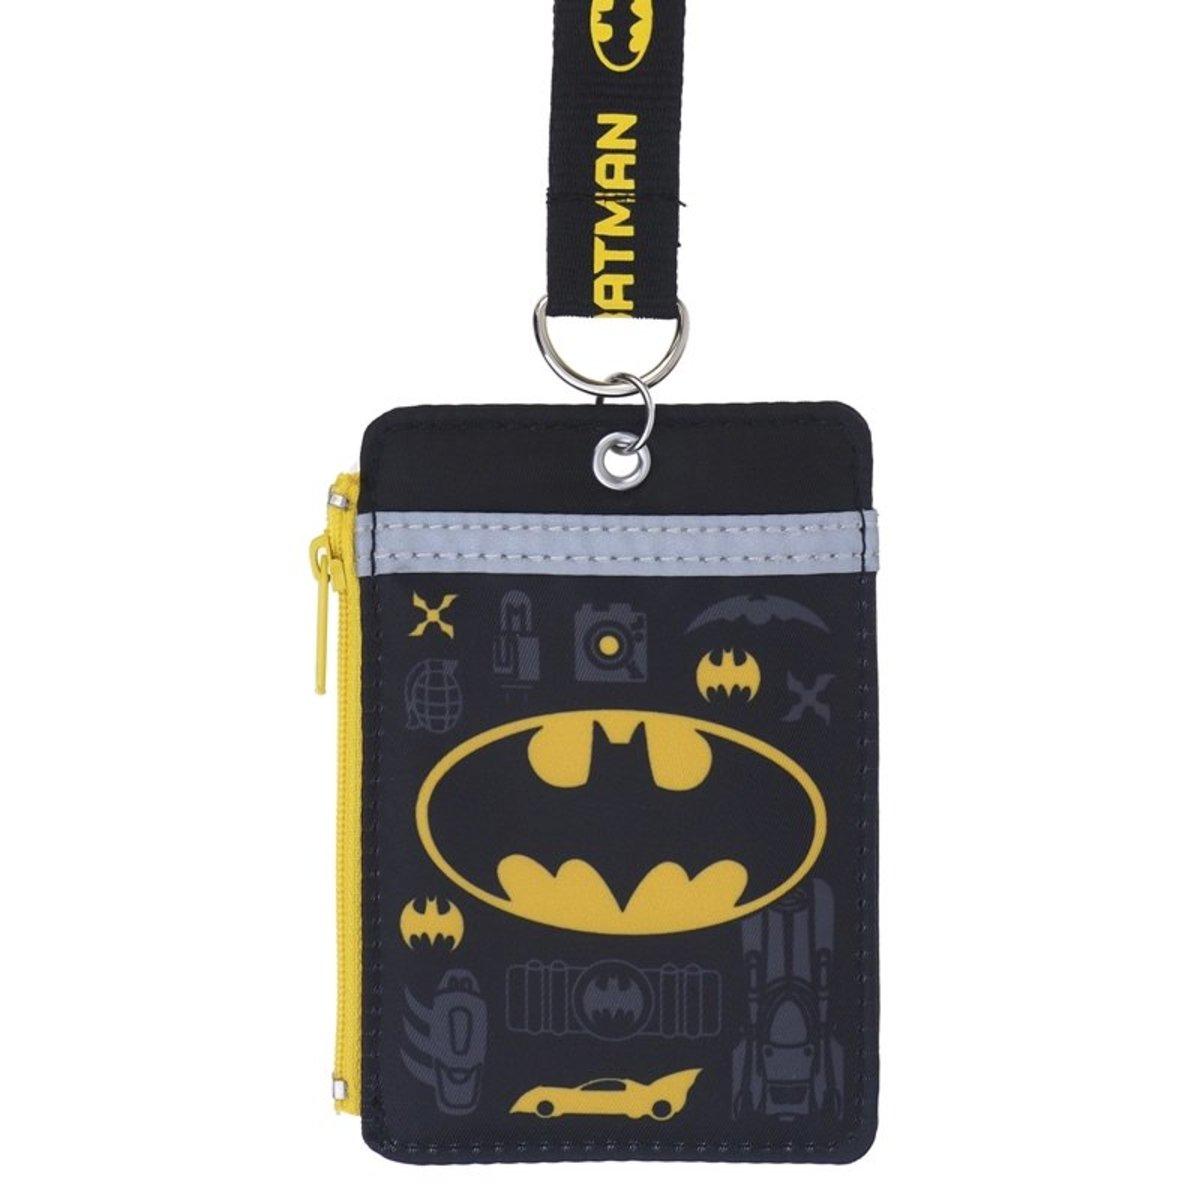 Batman Card Holder with NeckStrap